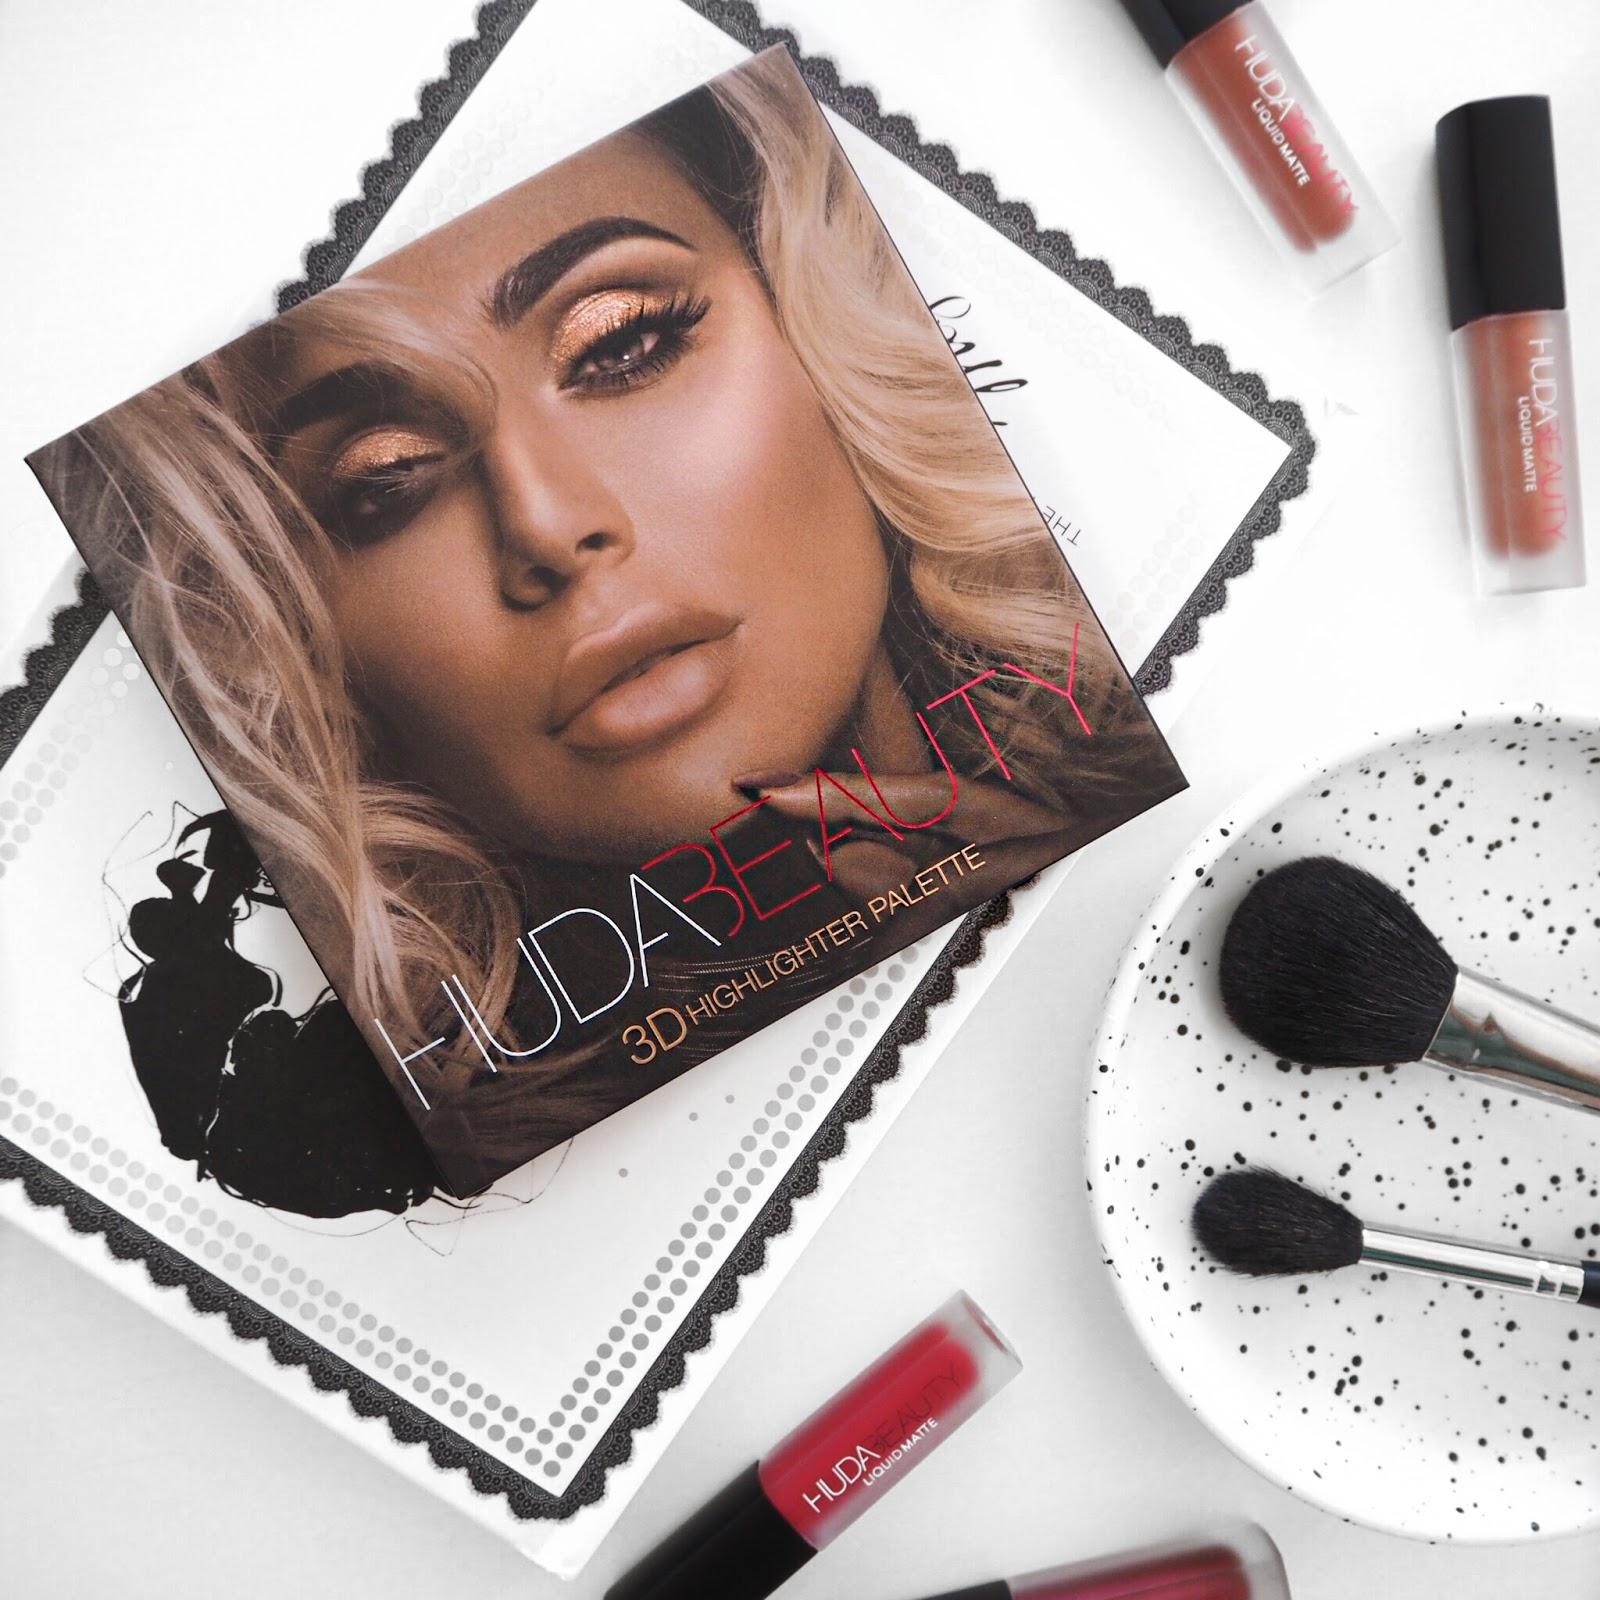 Huda Beauty 3D Highlighter Palette Review